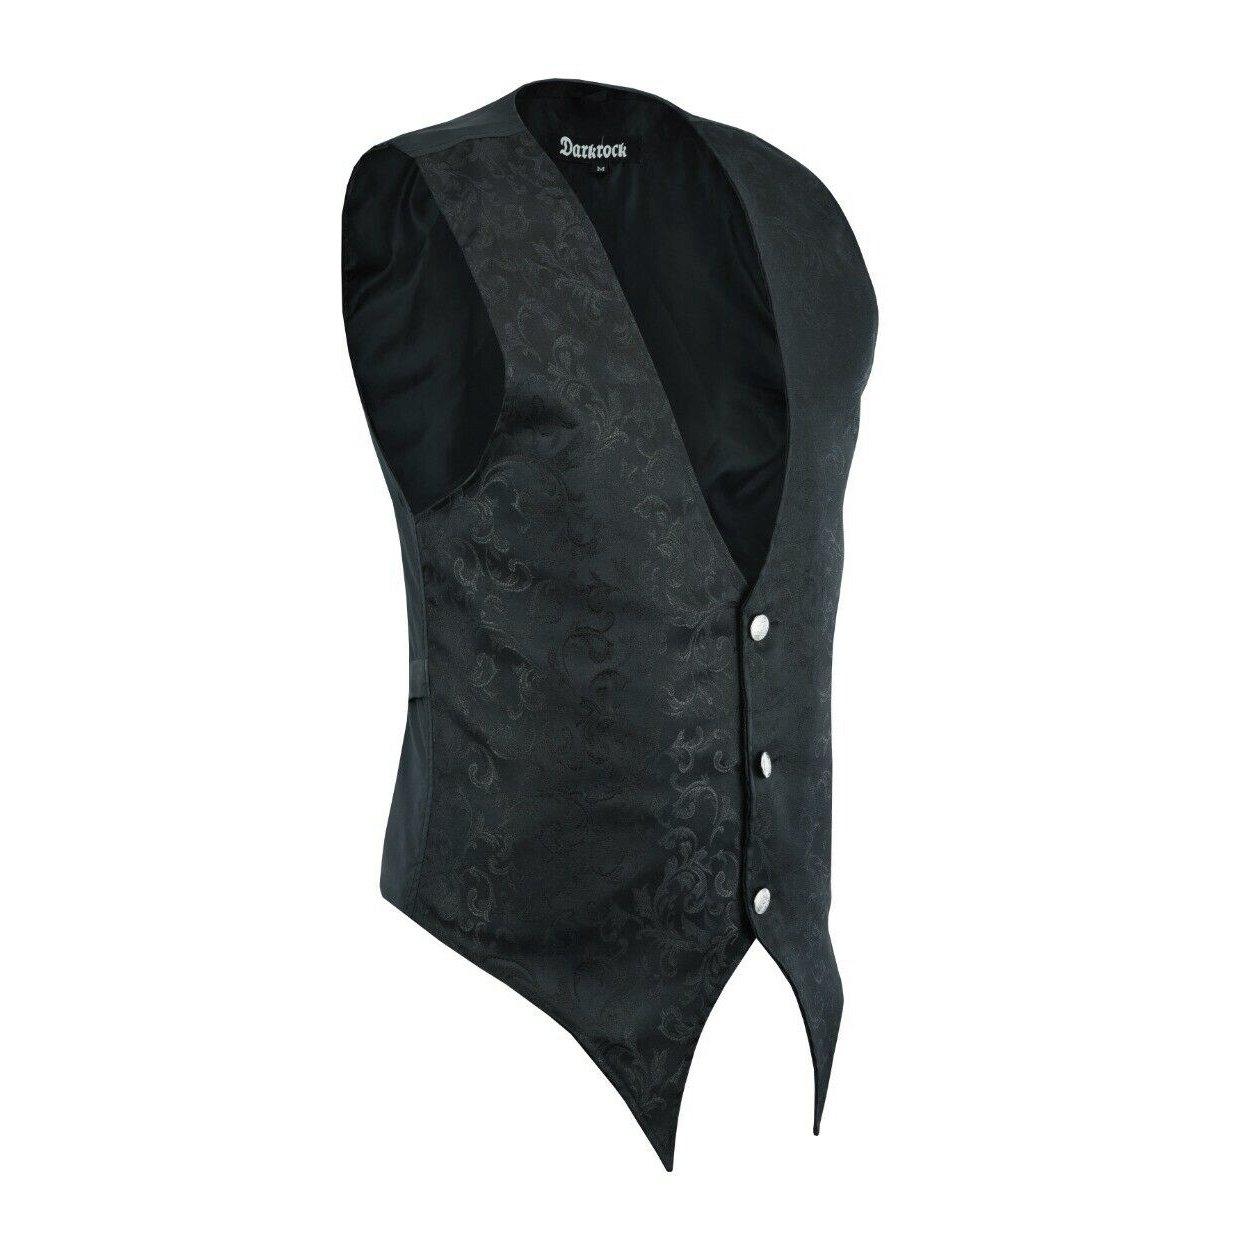 DARKROCK Victorian Single Breasted Brocade Vest Regency Waistcoat (2)